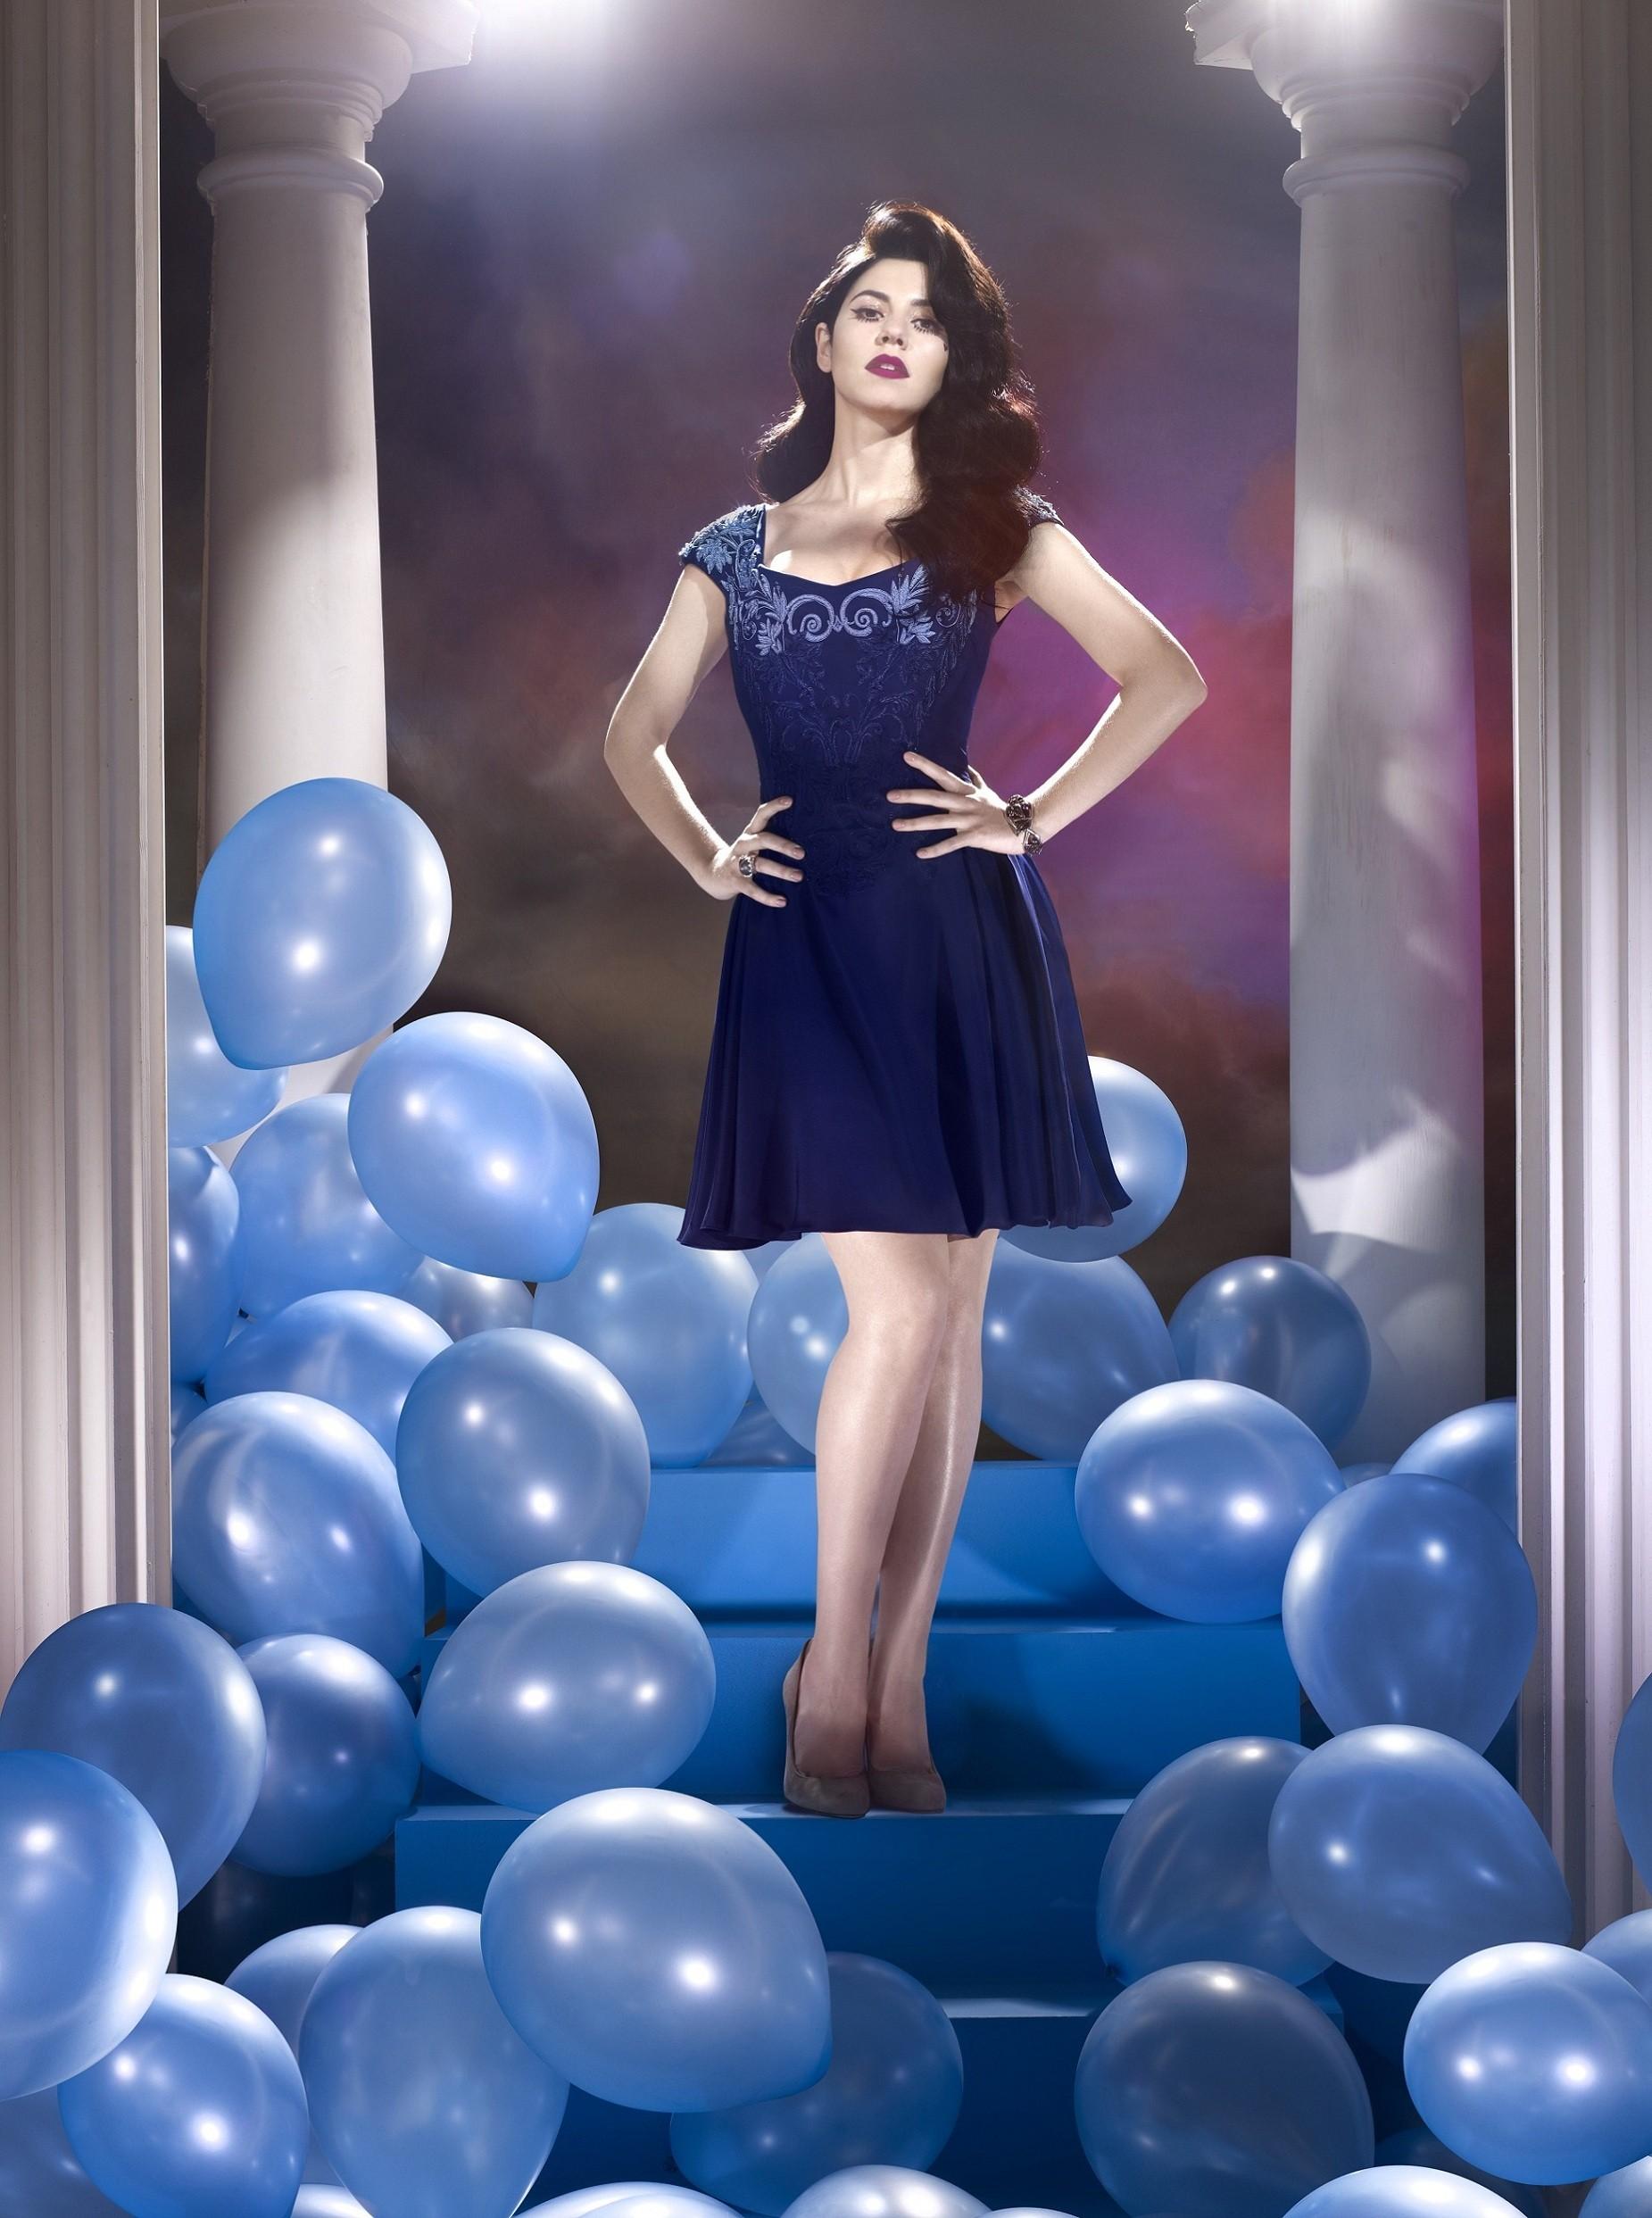 Marina And The Diamonds 7